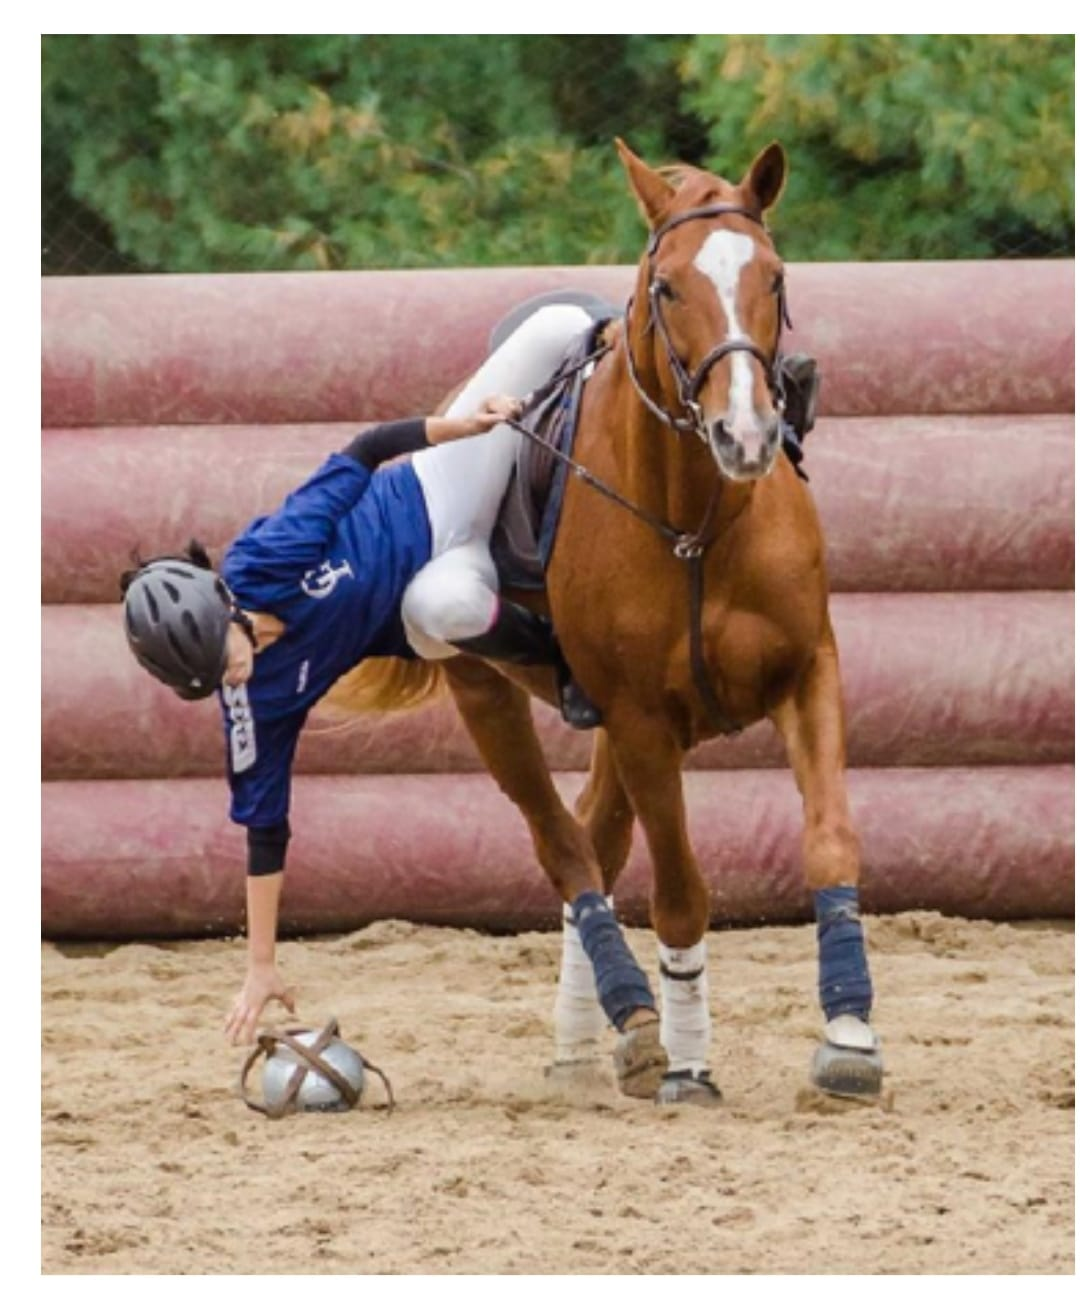 jeux a poney horse-ball